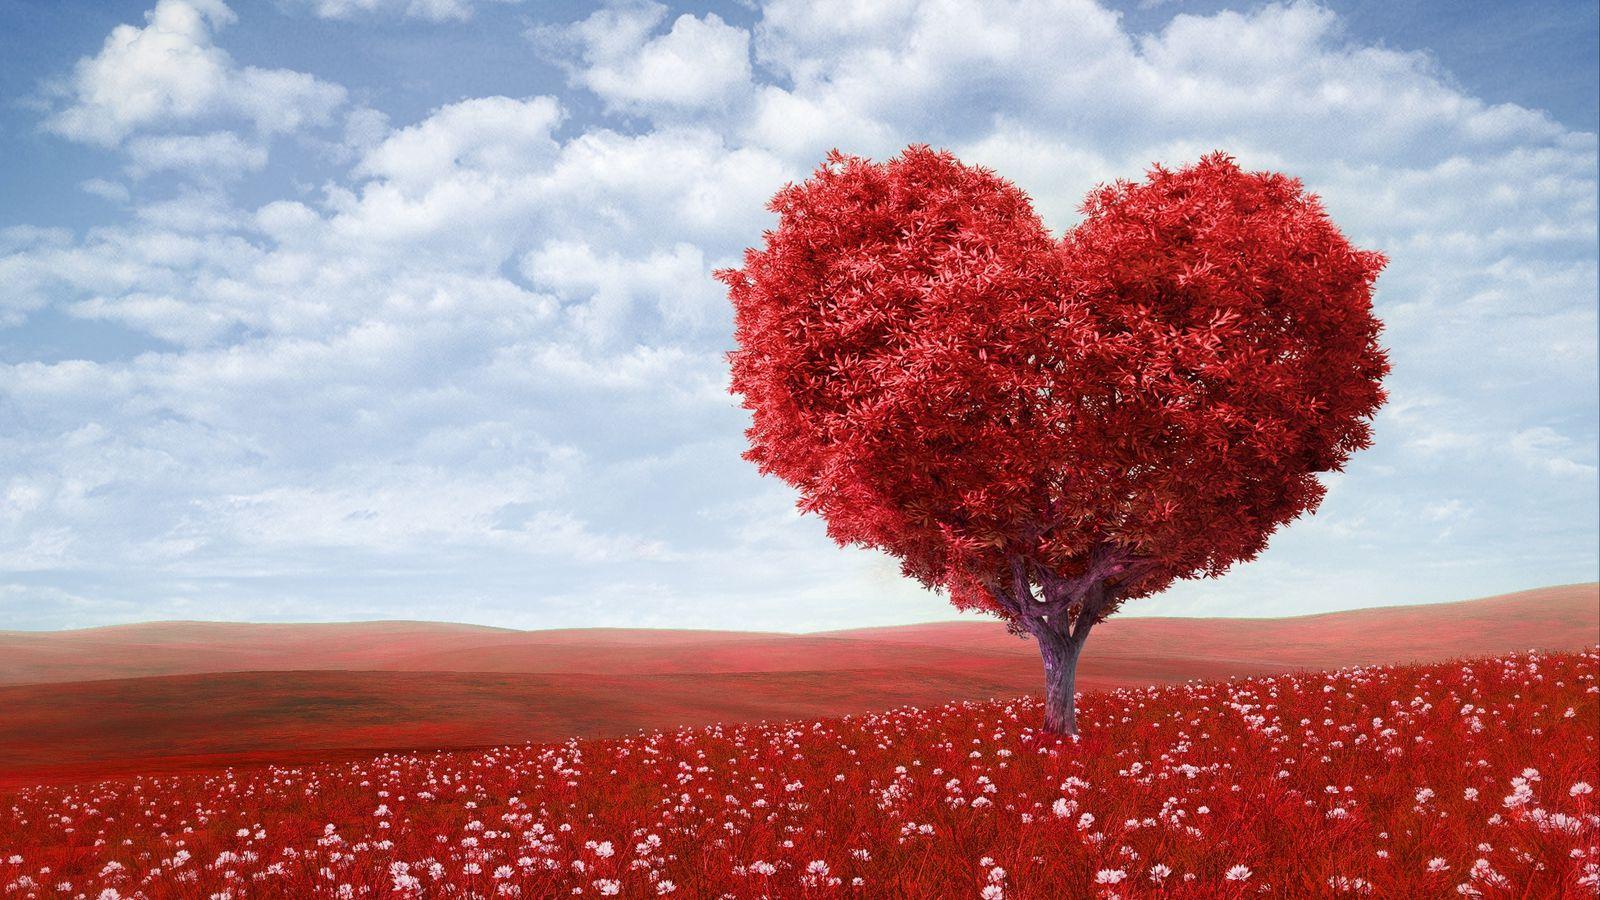 1600x900 Wallpaper tree, heart, photoshop, field, grass, romance